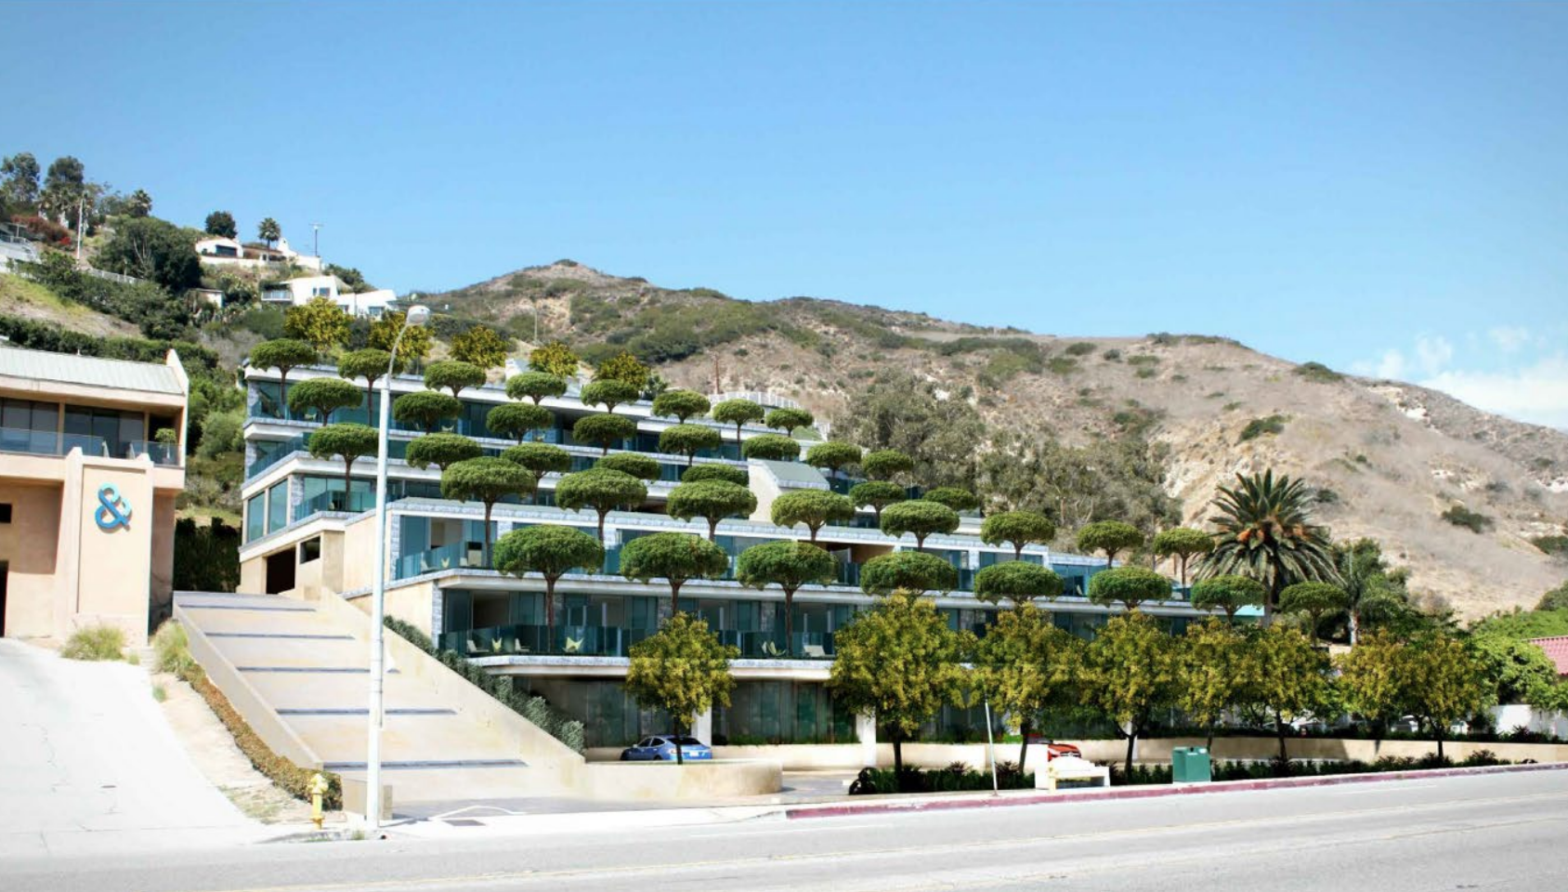 Sea View Hotel Malibu Rendering